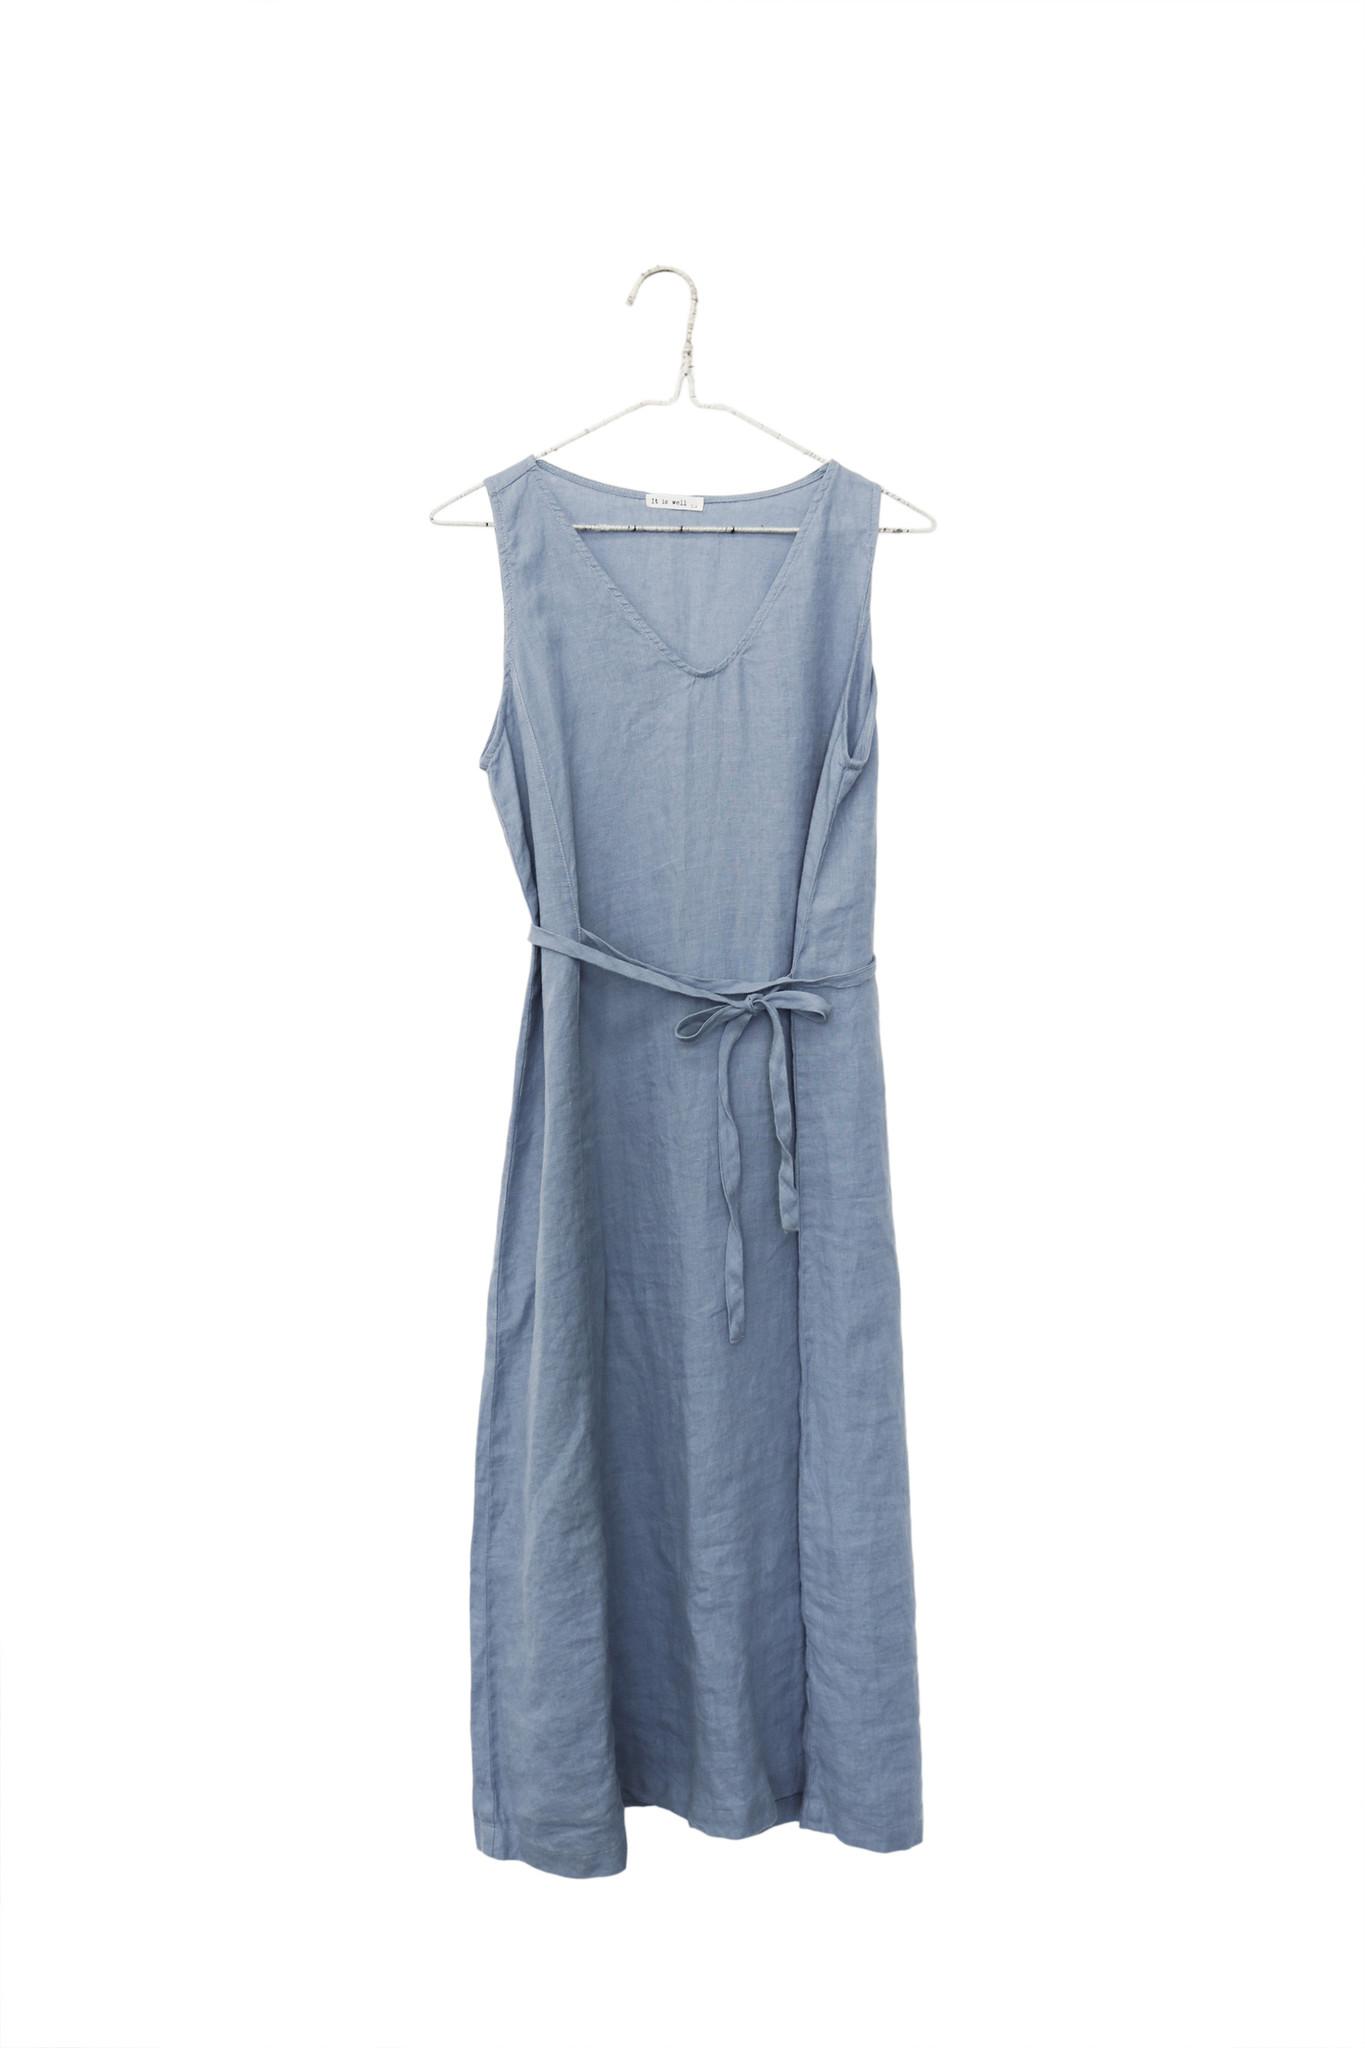 It Is Well L.A. It Is Well L.A. Tie Dress in Blue